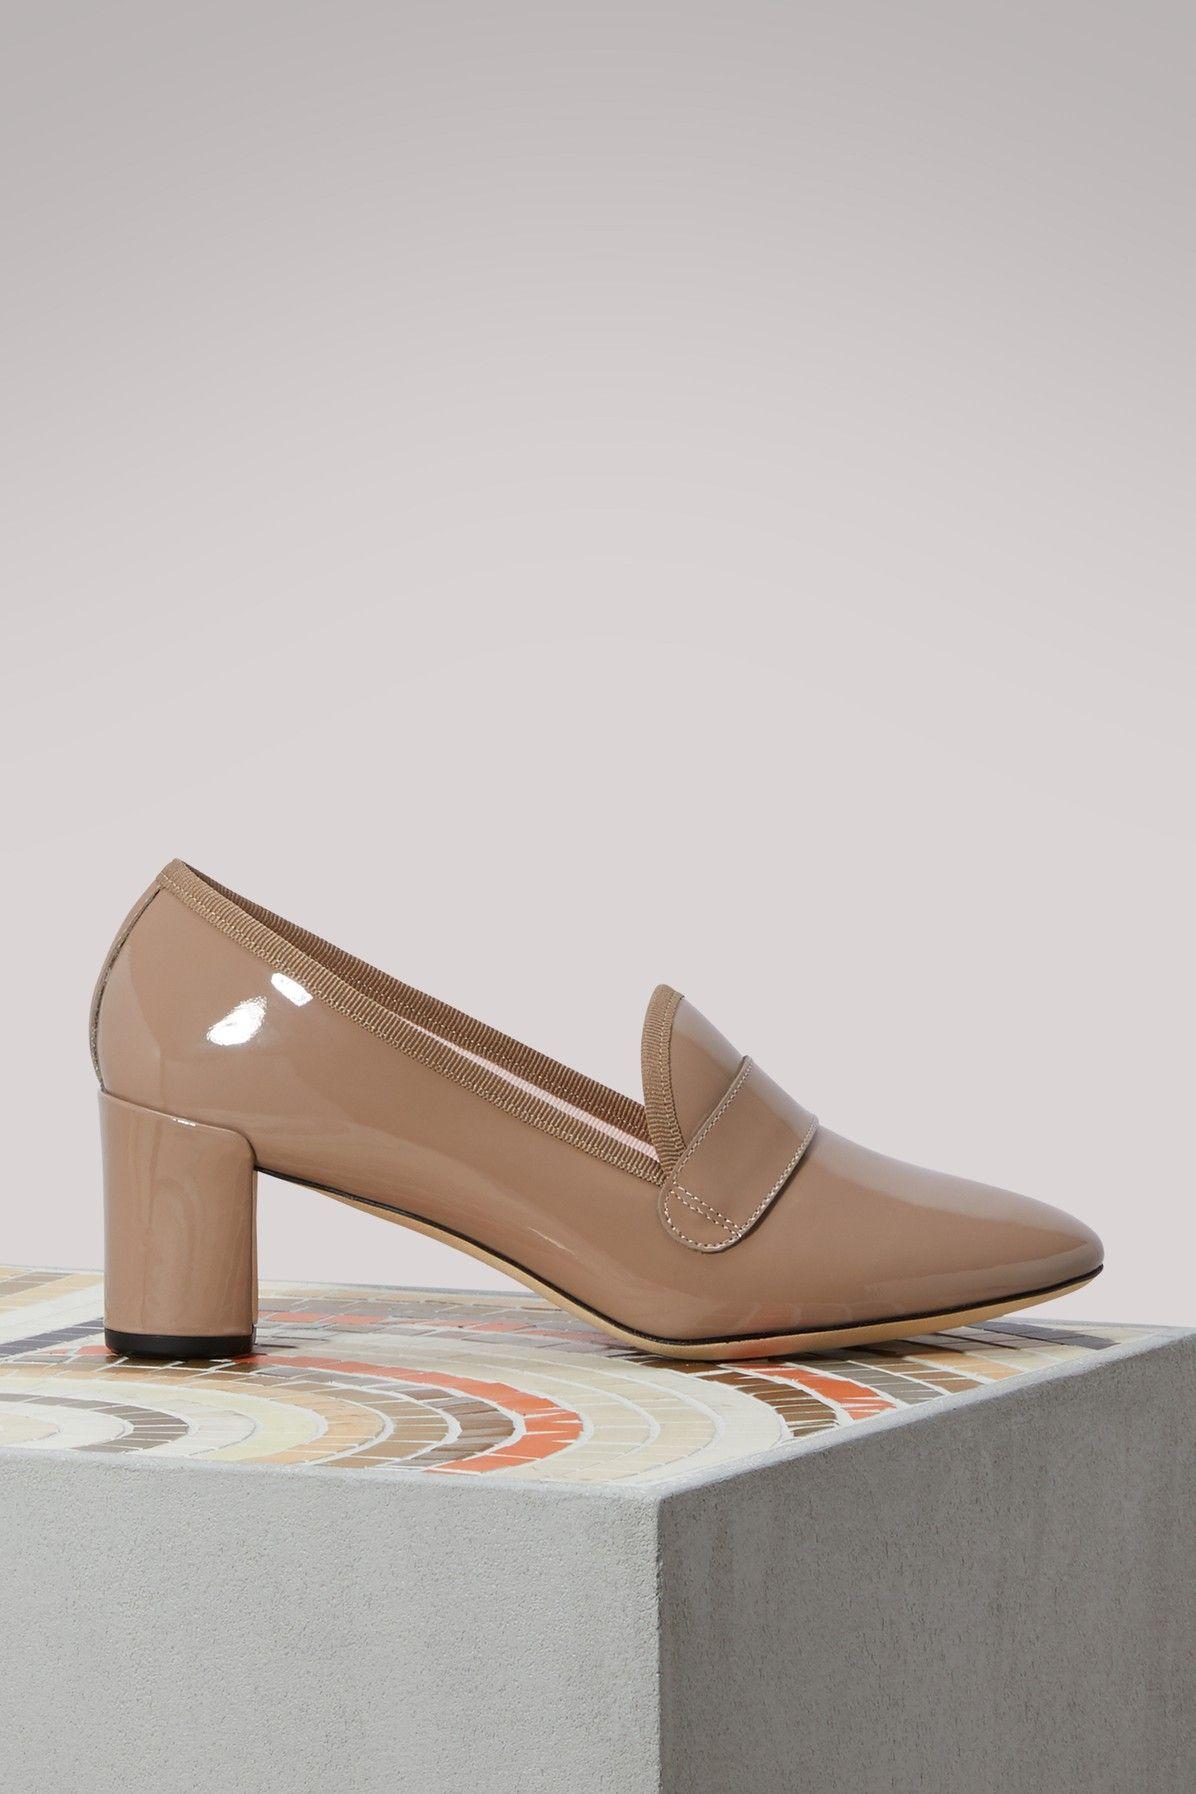 Repetto Loafers Elvis Noir dZE8Fs